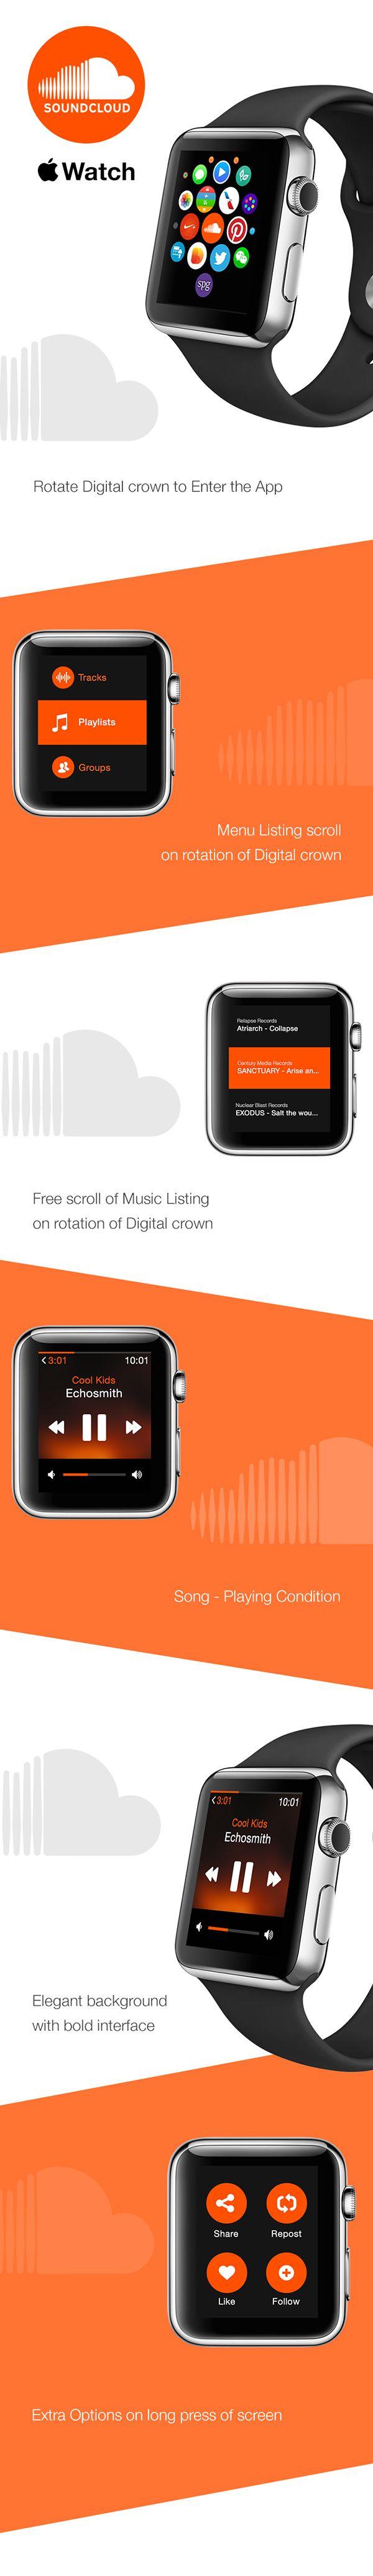 Soundcloud Apple watch on Behance Apple watch design